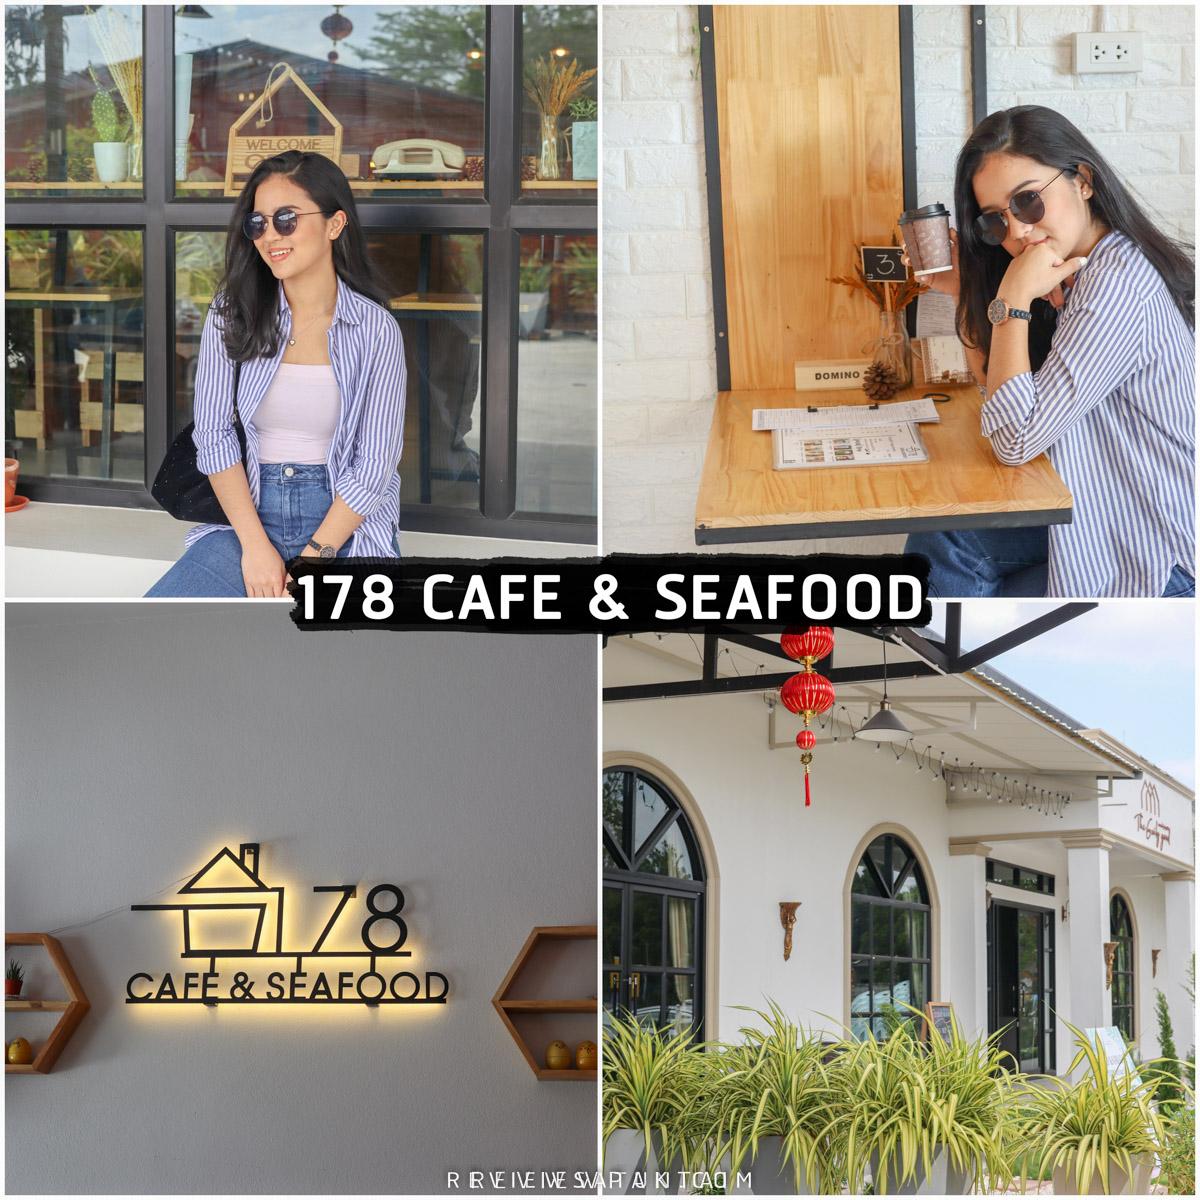 178 Cafe & Seafood ร้านอาหารร้านเด็ดติดอันดับของสตูล อร่อยจริงอะไรจริง พร้อมมีมุมคาเฟ่สไตล์มินิมอลสวยๆ รายละเอียด คลิก จุดเช็คอิน,หลีเป๊ะ,สตูลสดยกกำลังสาม,satunwonderland,เที่ยวเมืองไทยAmazingกว่าเดิม,ชีพจรลงSouth